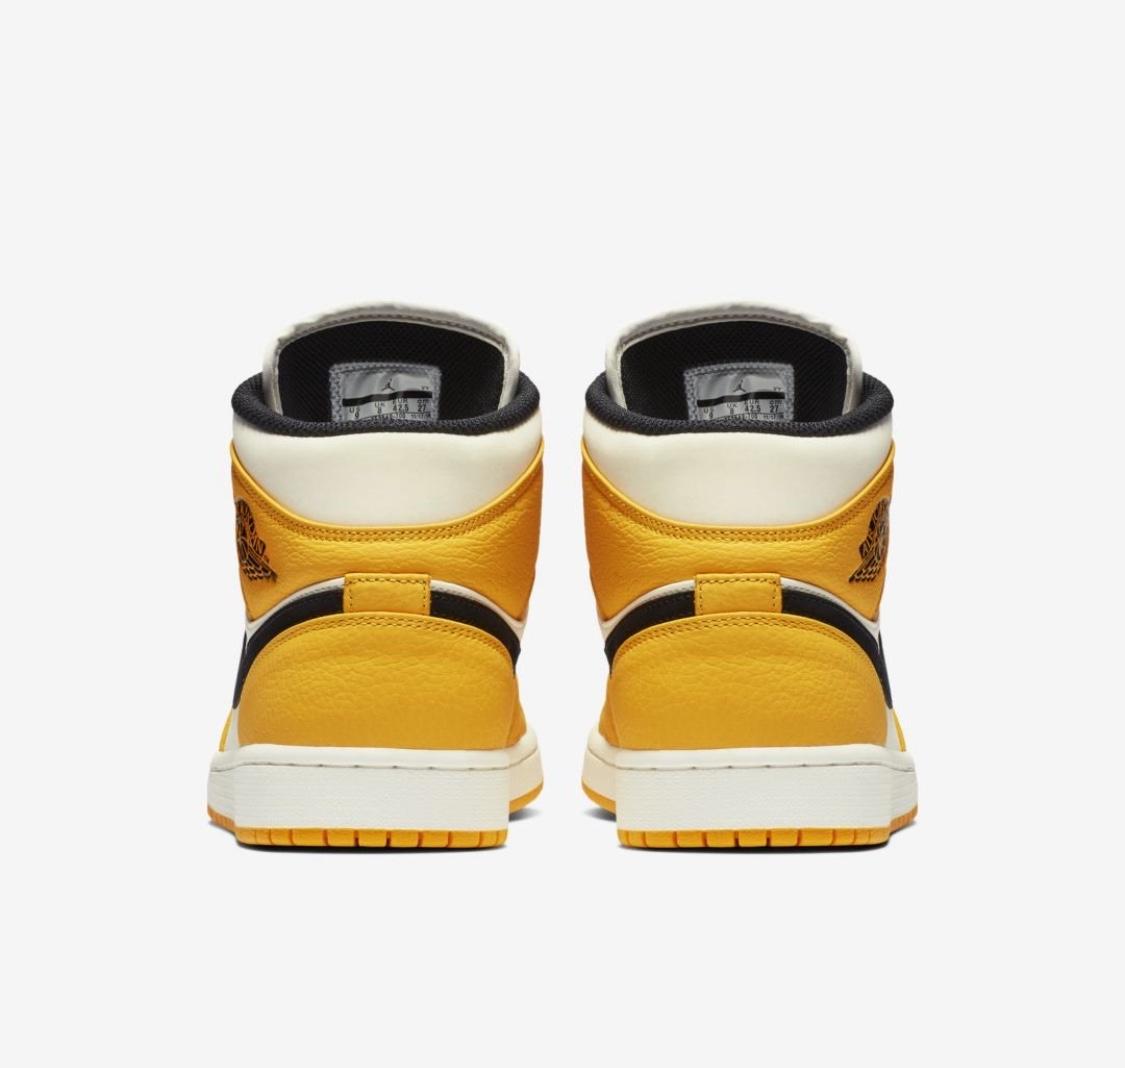 a527d11449ab72 Air-Jordan-1-Mid-SE-Lakers-3 - WearTesters